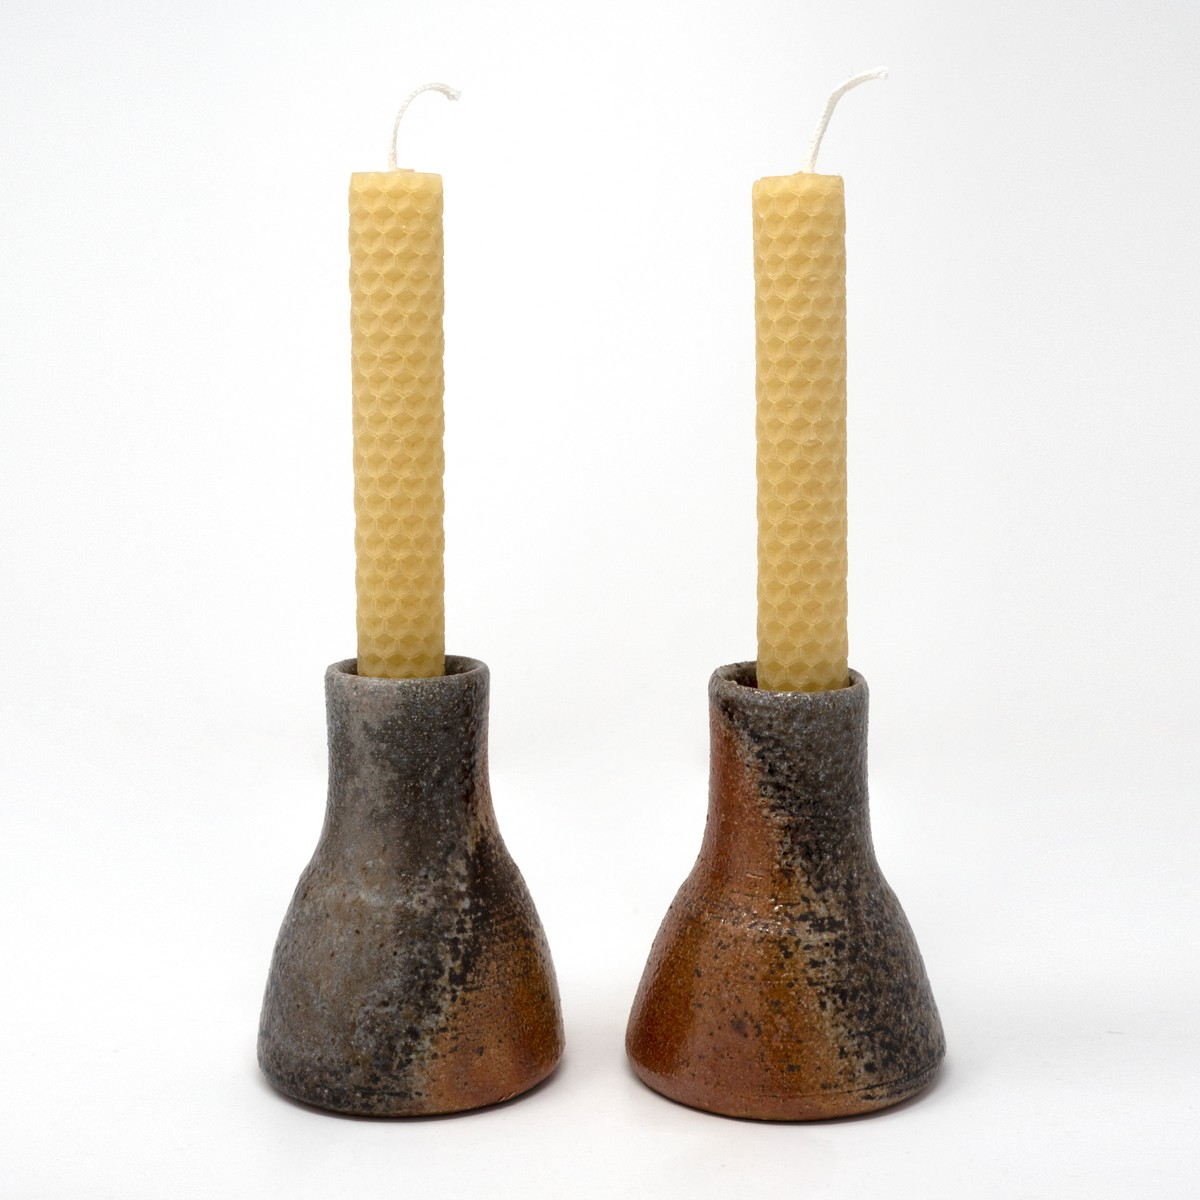 Photo of Woodfired Candlestick Gift Set